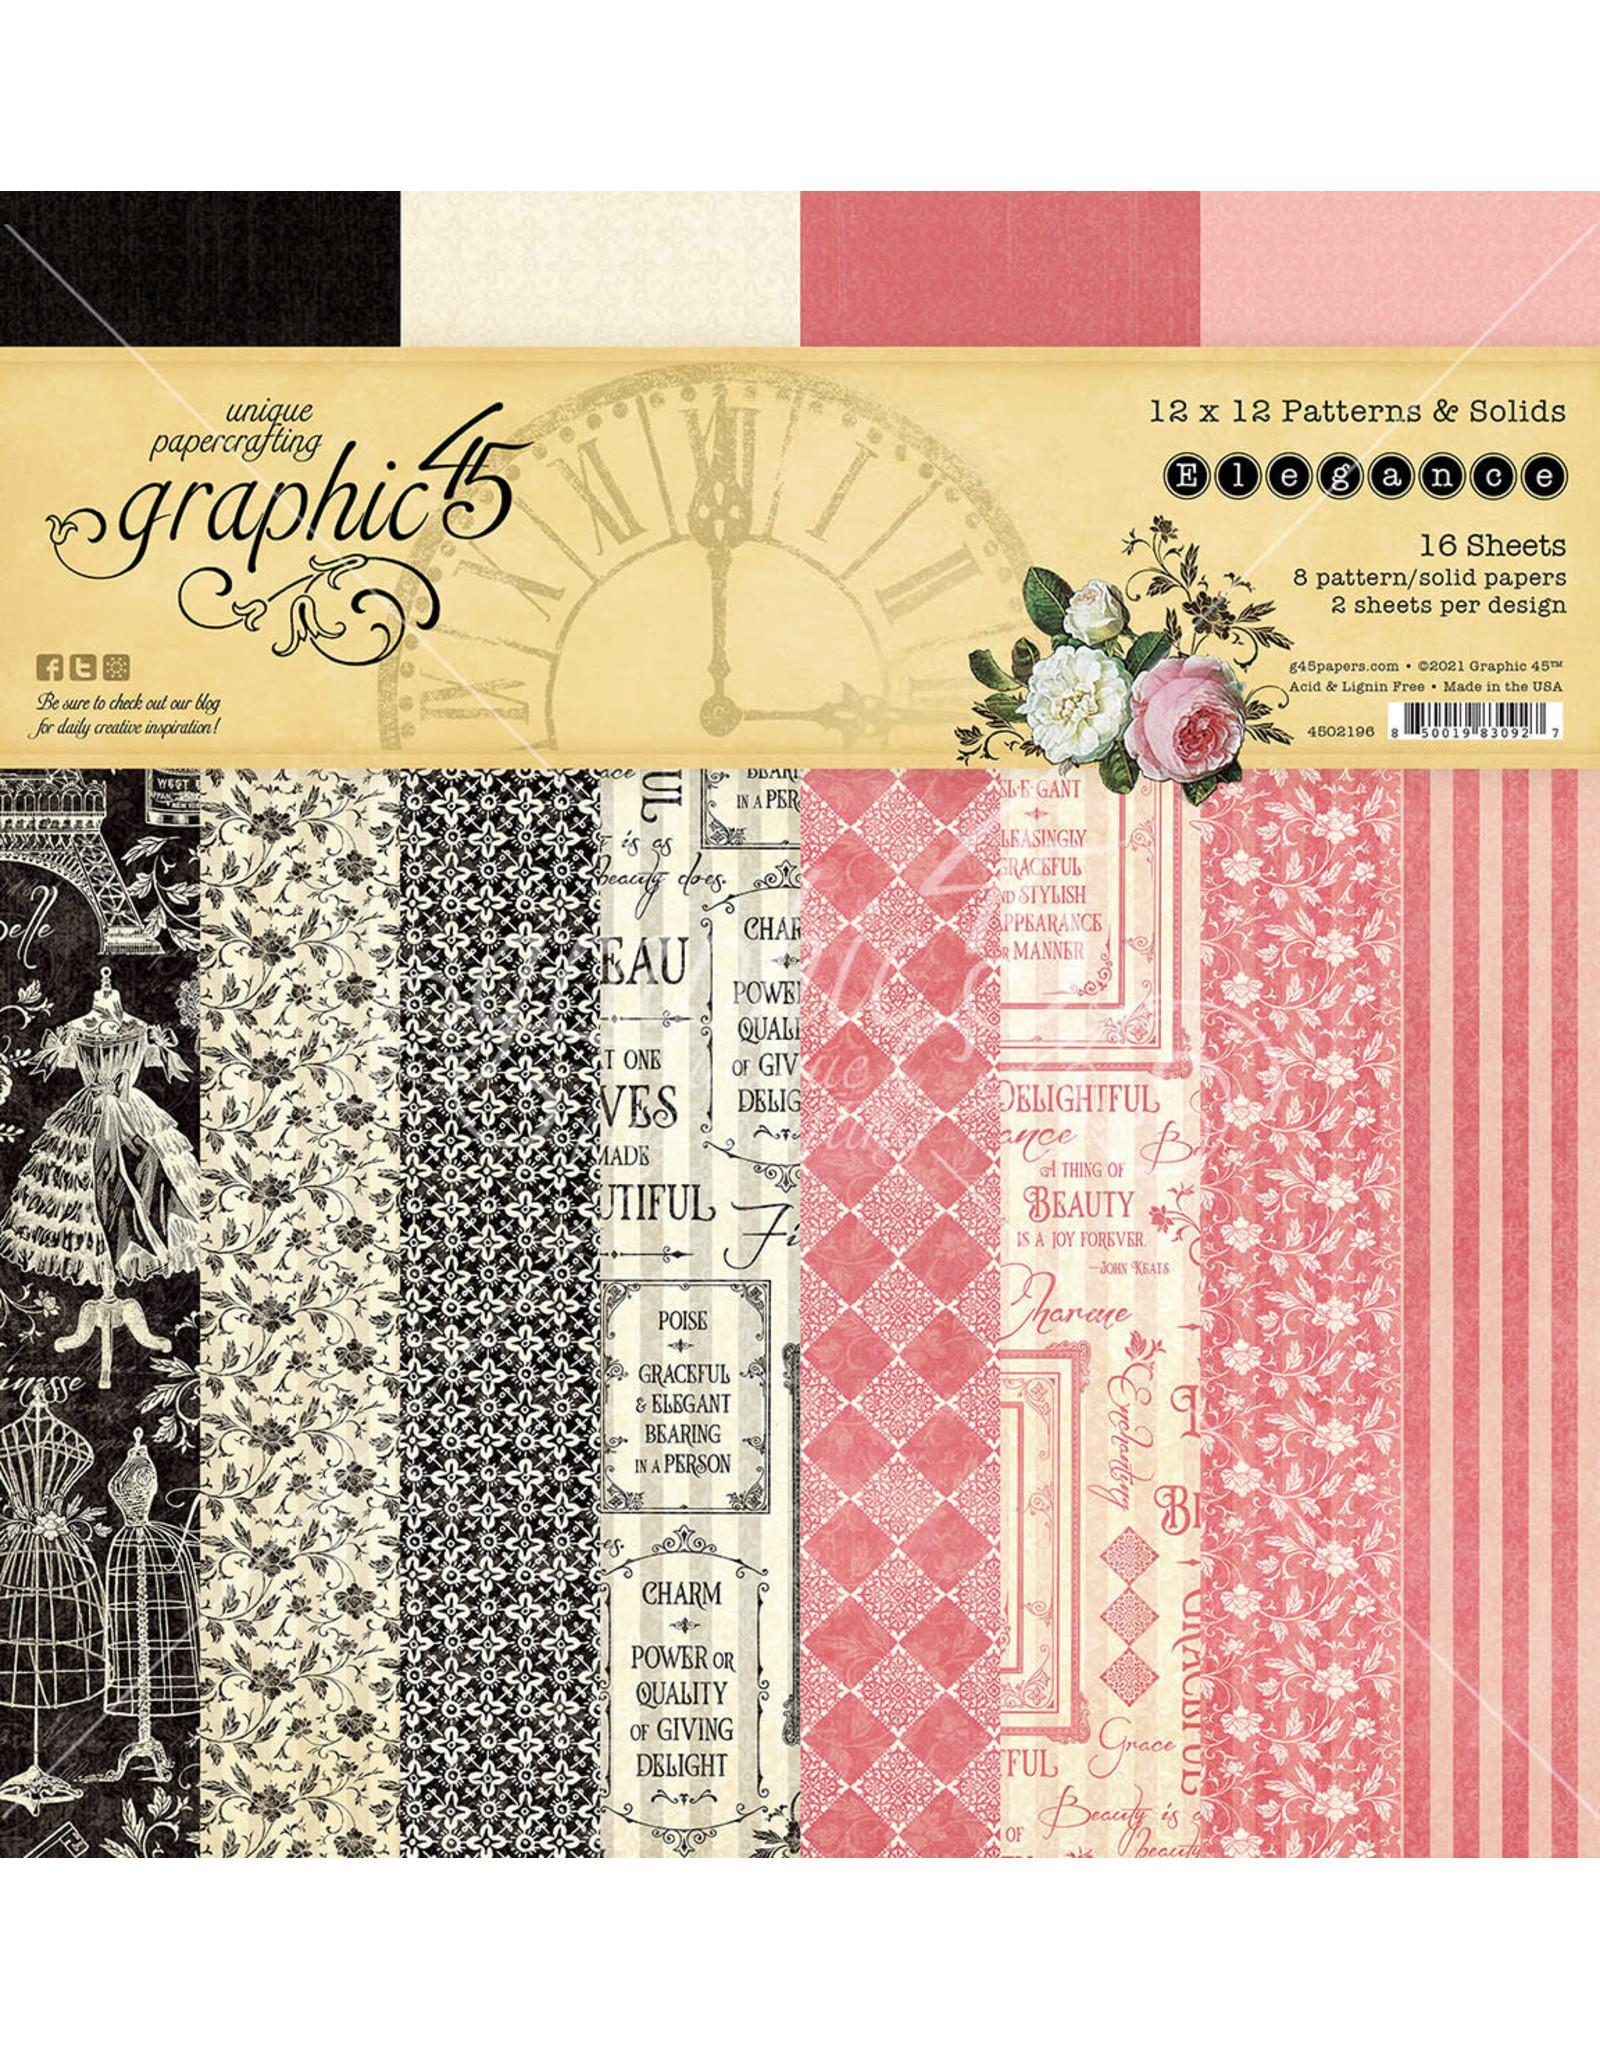 Graphic 45 Graphic 45 Elegance Patterns & solids 12 x 12 ( 30.5 x 30.5cm)